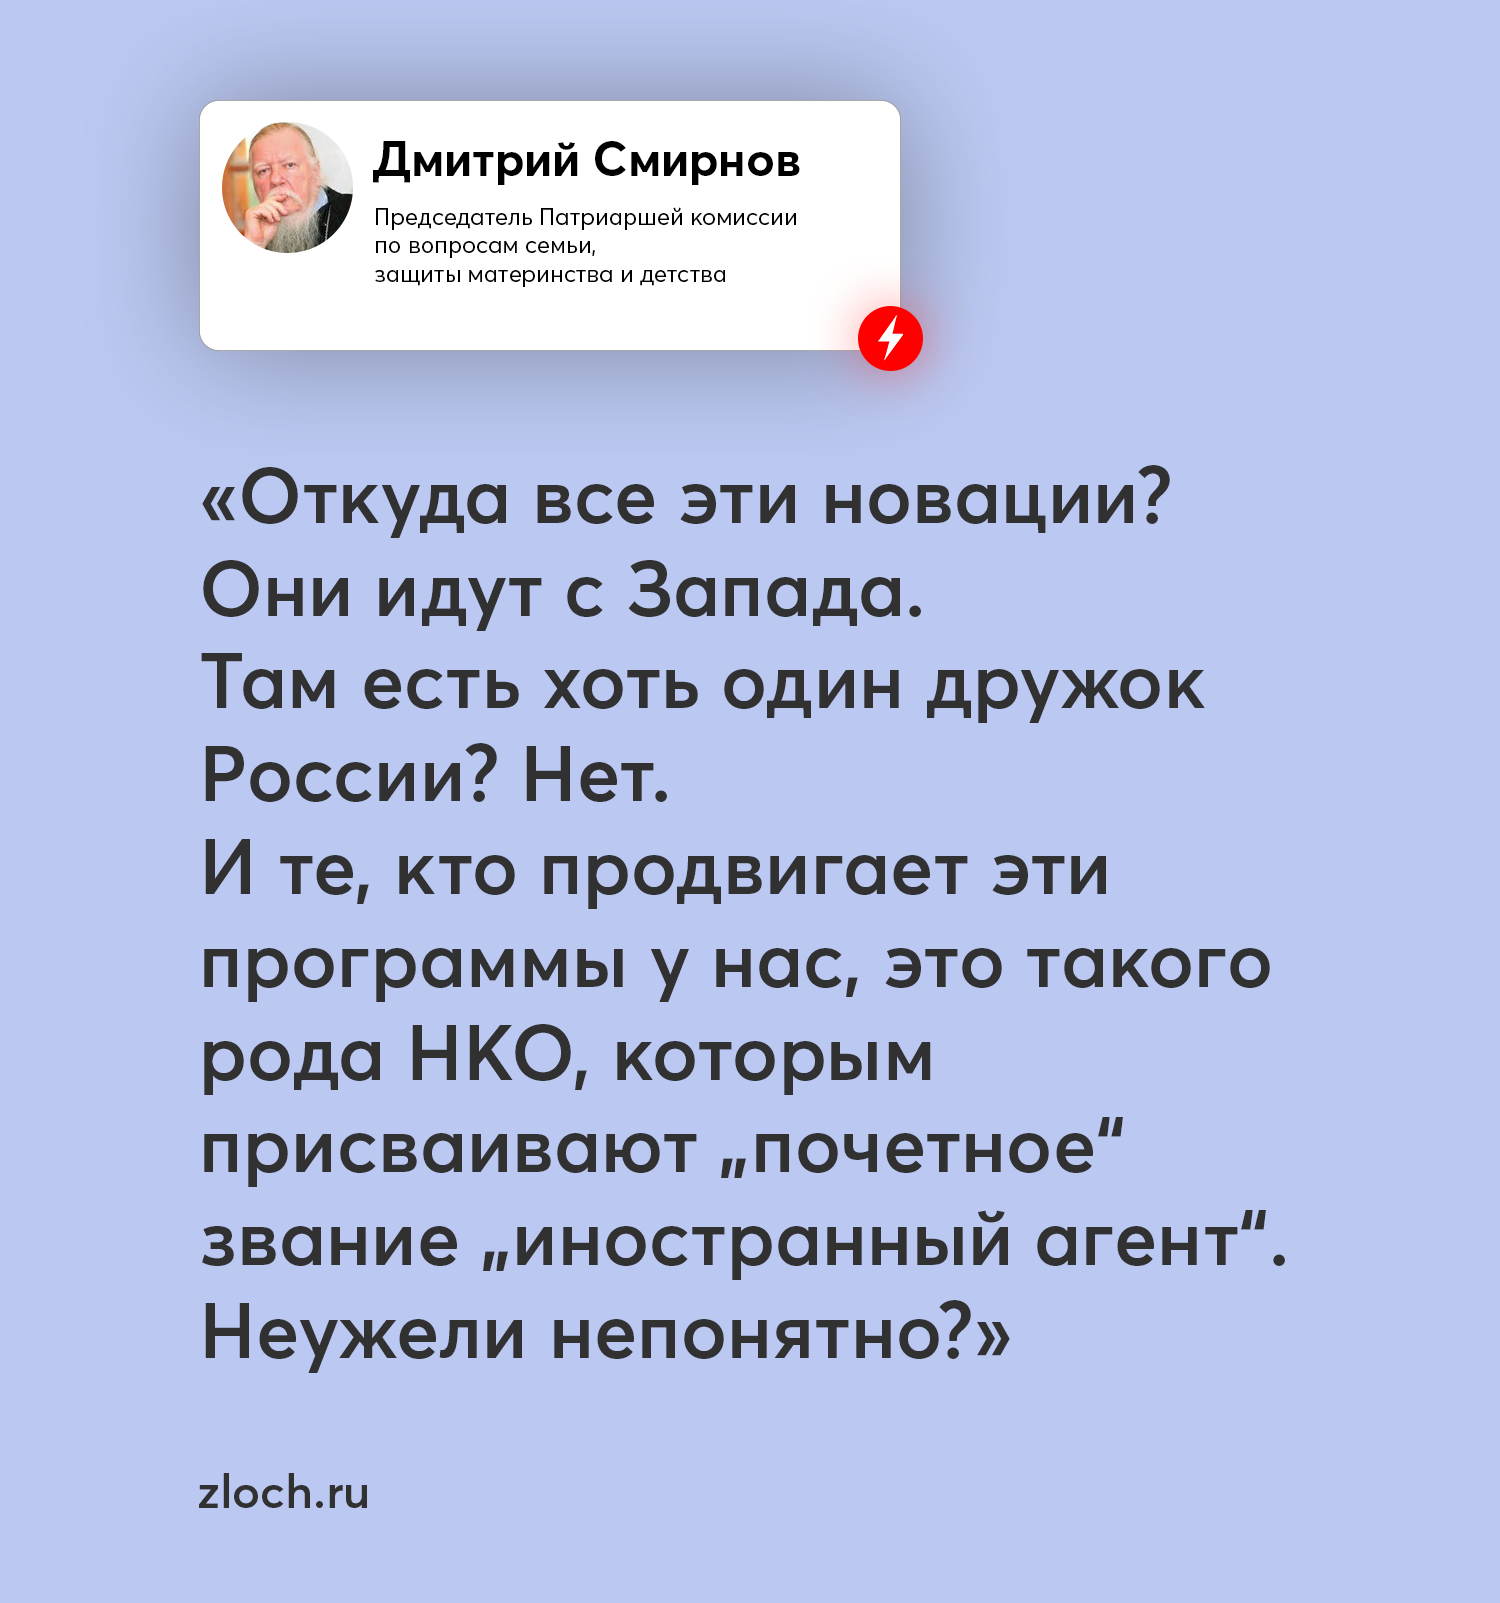 В РПЦ поддержали петицию о запрете программ профилактики ВИЧ